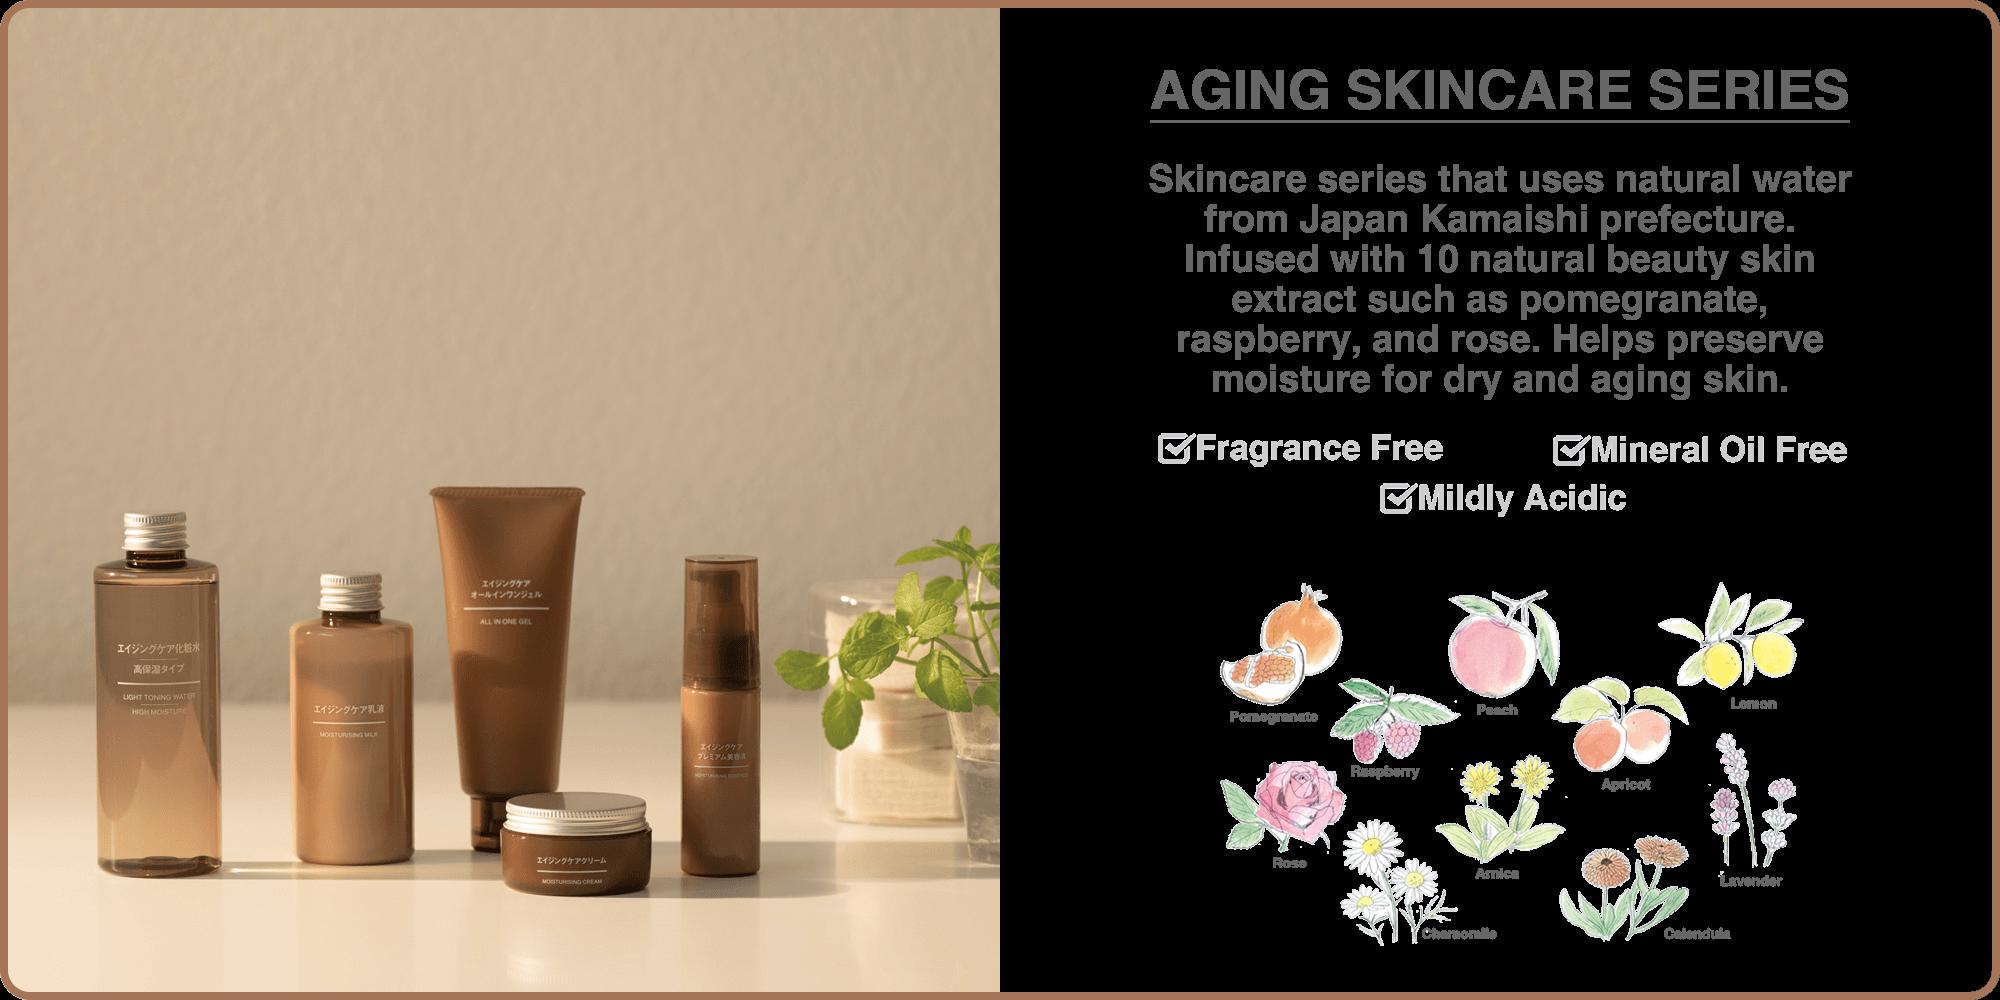 Aging skincare series